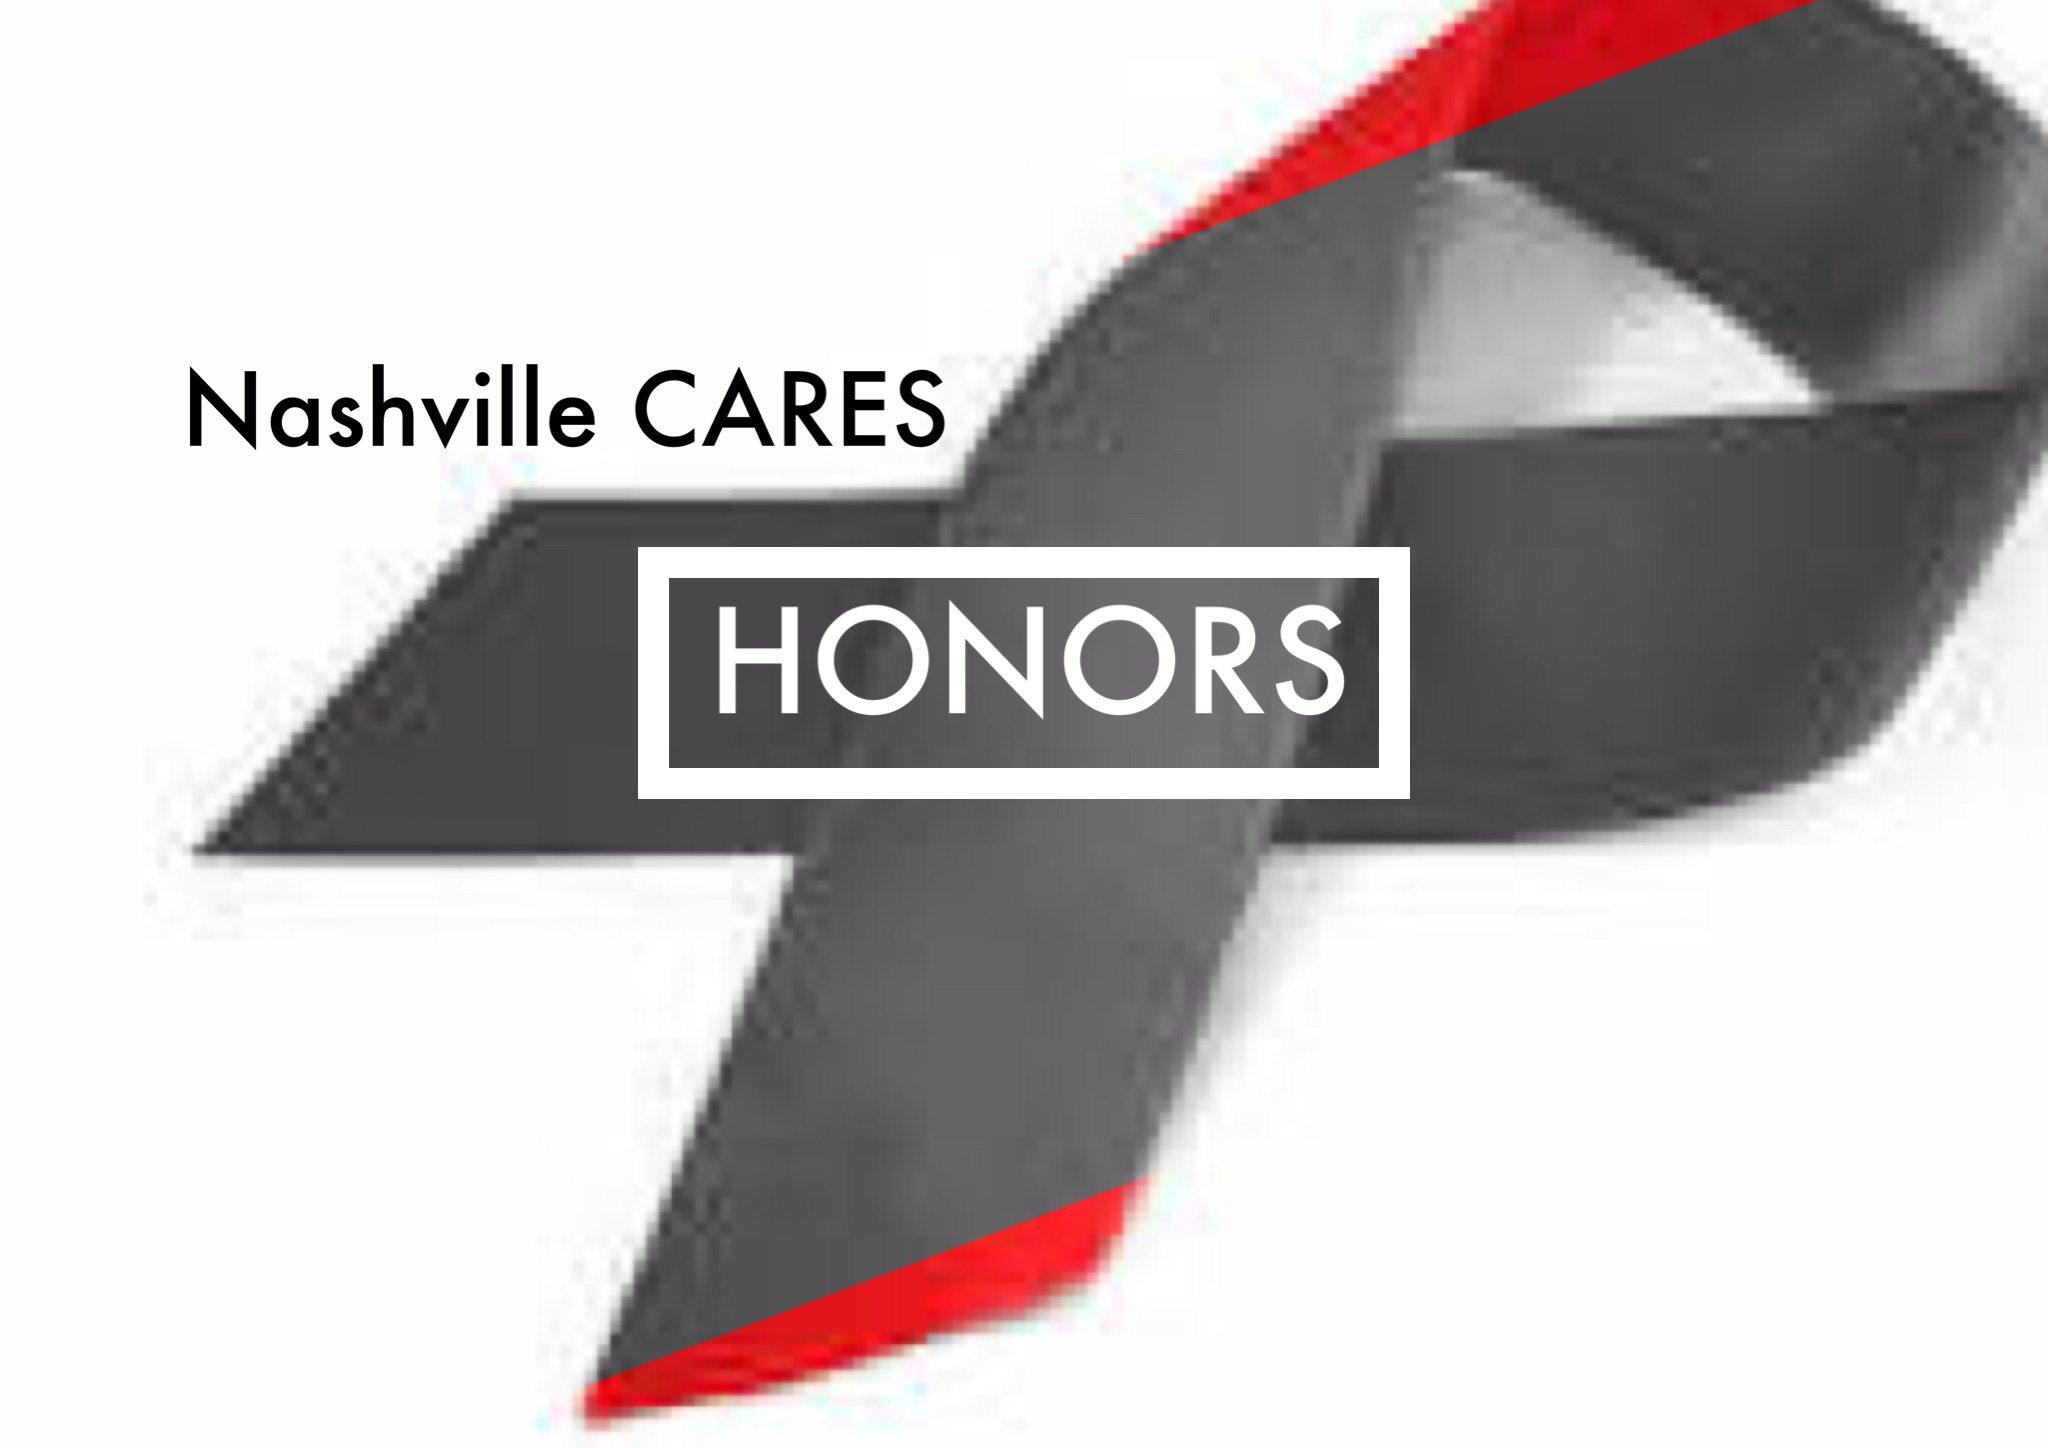 Nashville CARES Honors